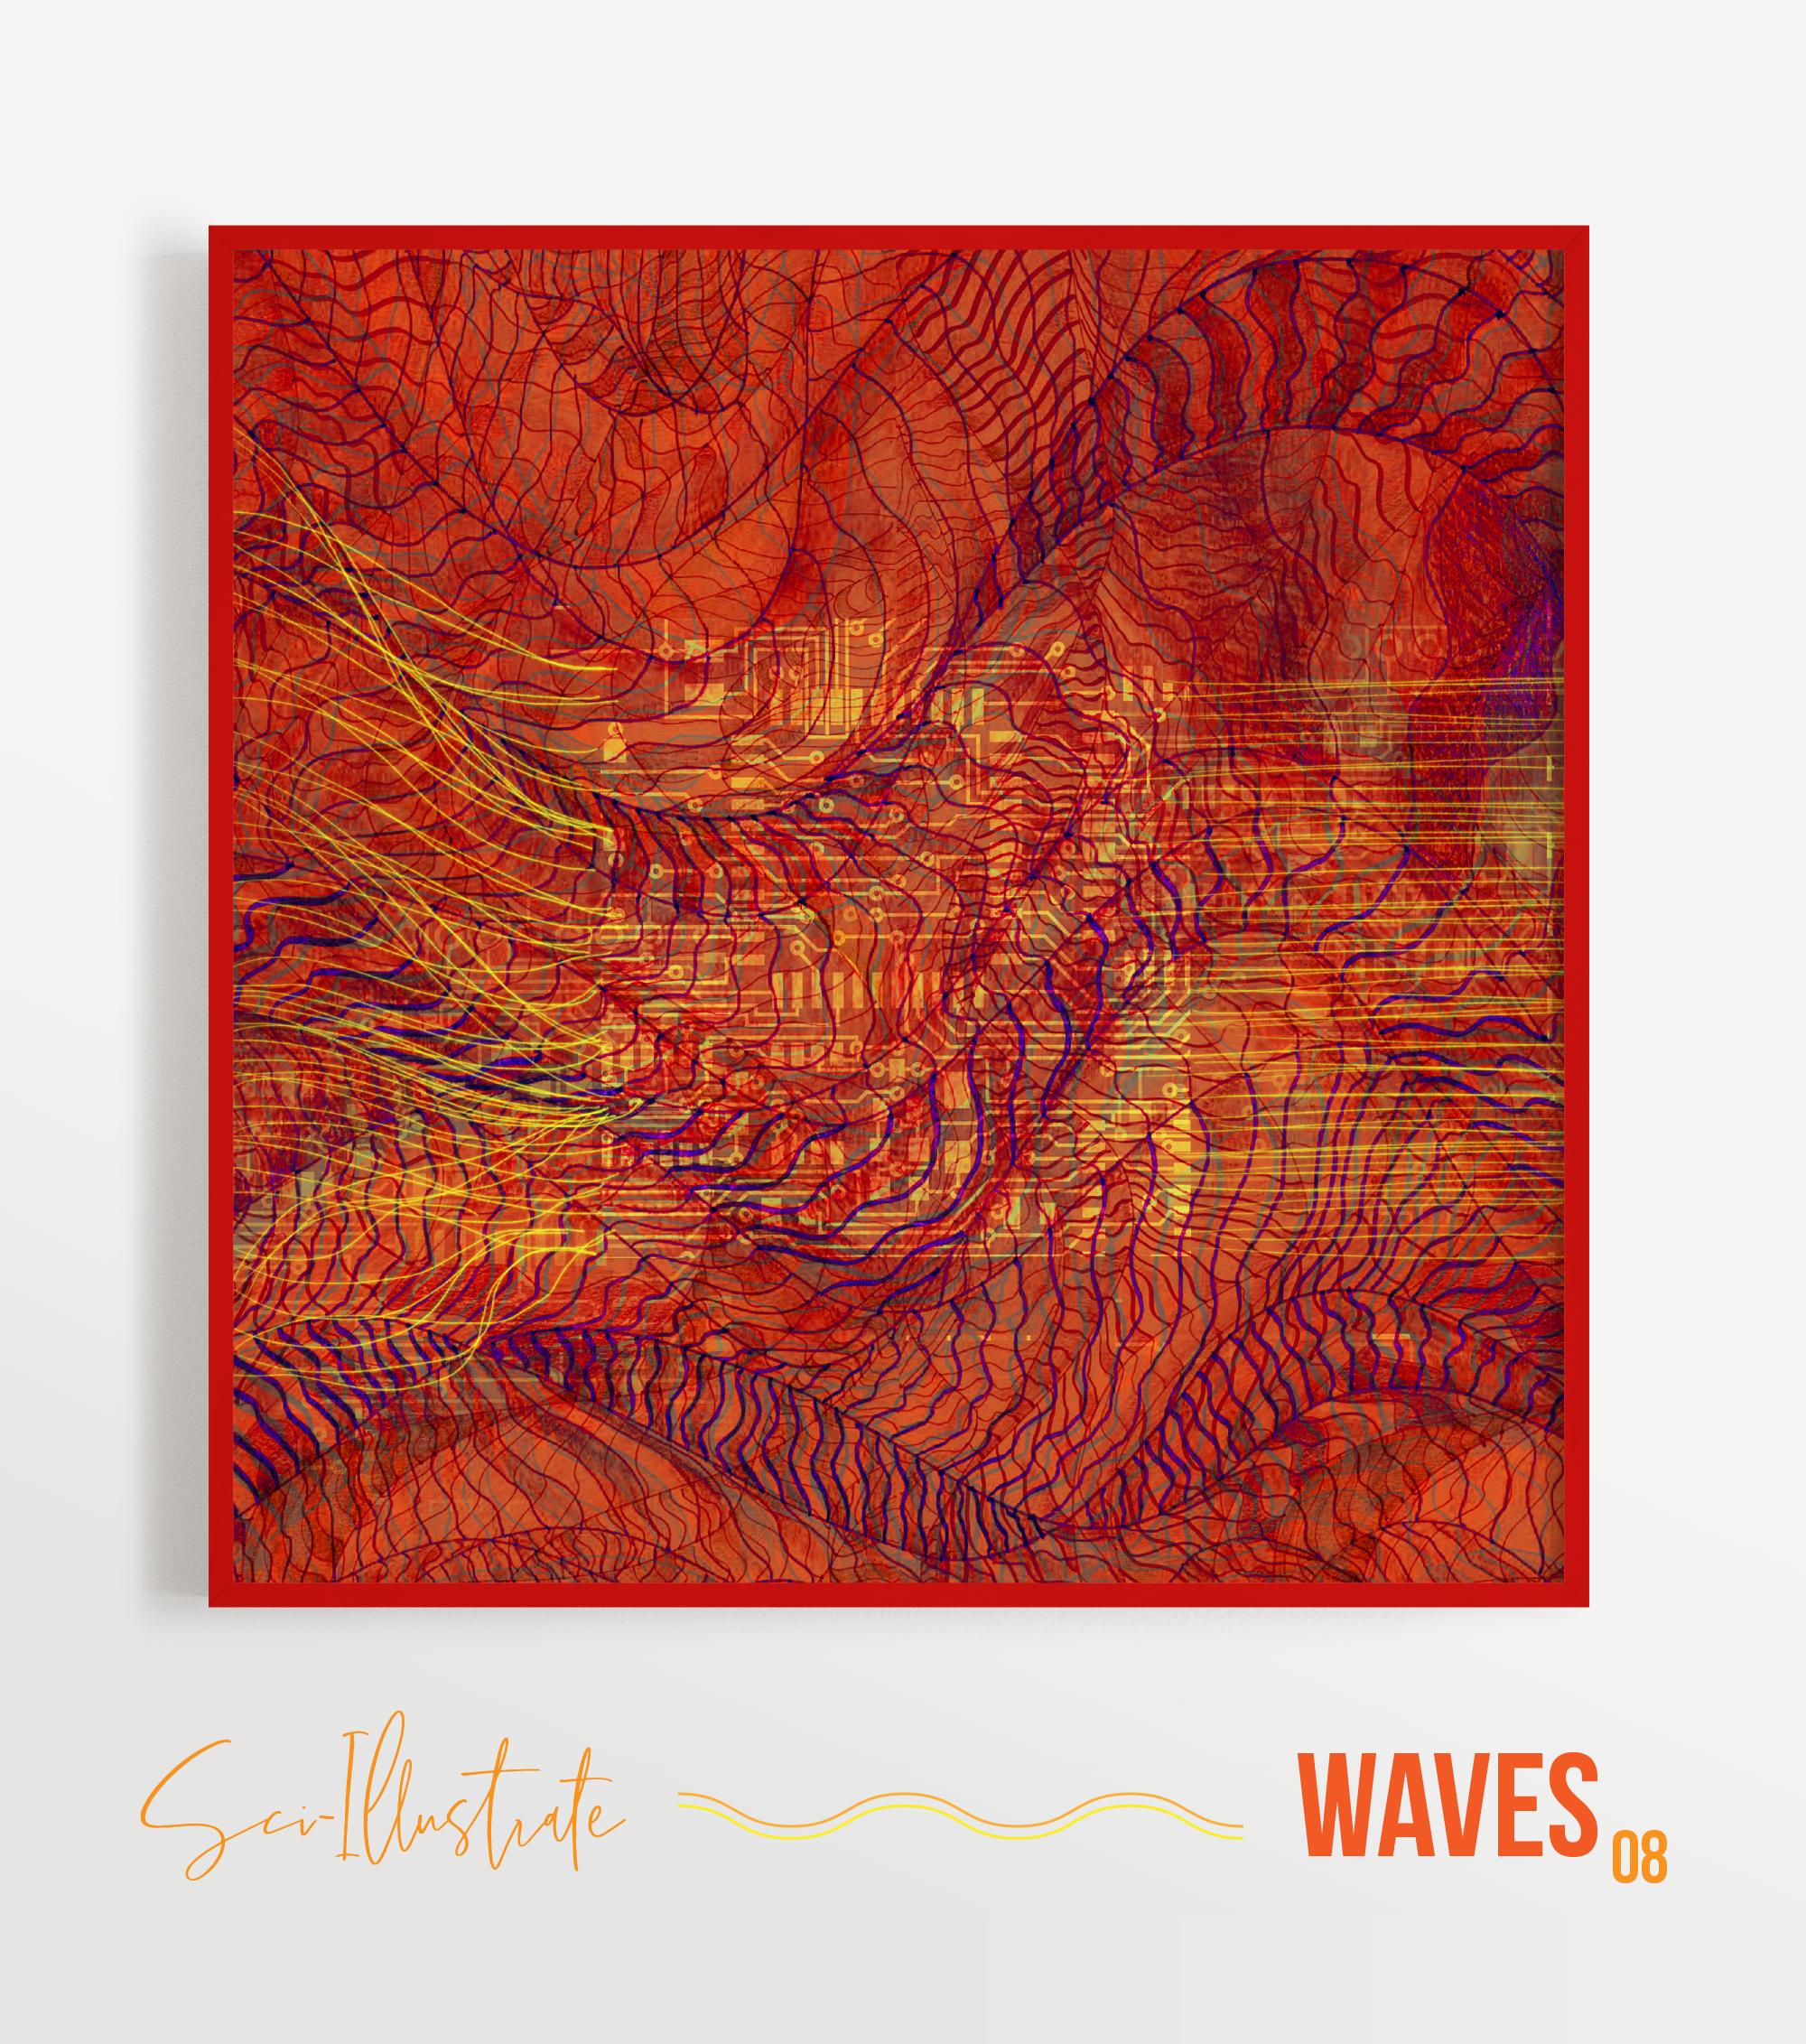 Sci-Illustrate waves 08-01.png